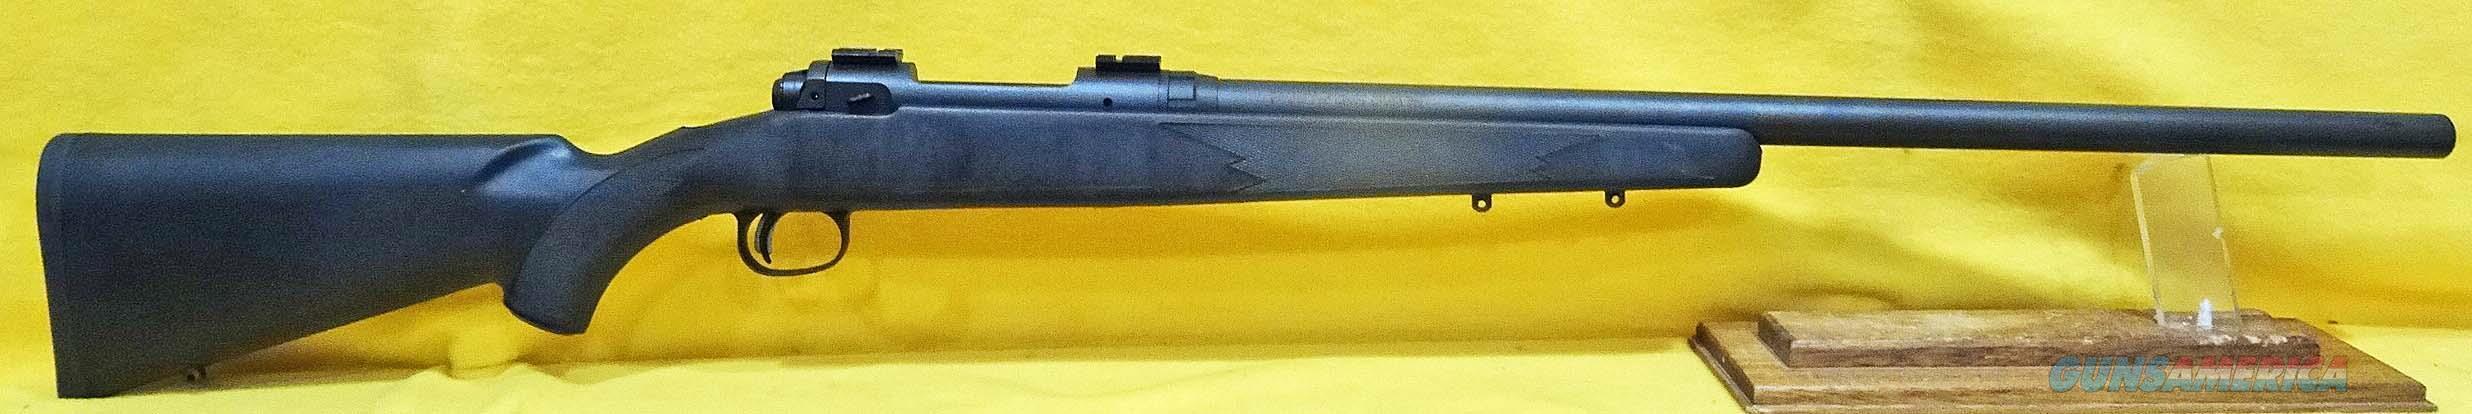 SAVAGE 10 (LEFT HAND BOLT)  Guns > Rifles > Savage Rifles > 10/110